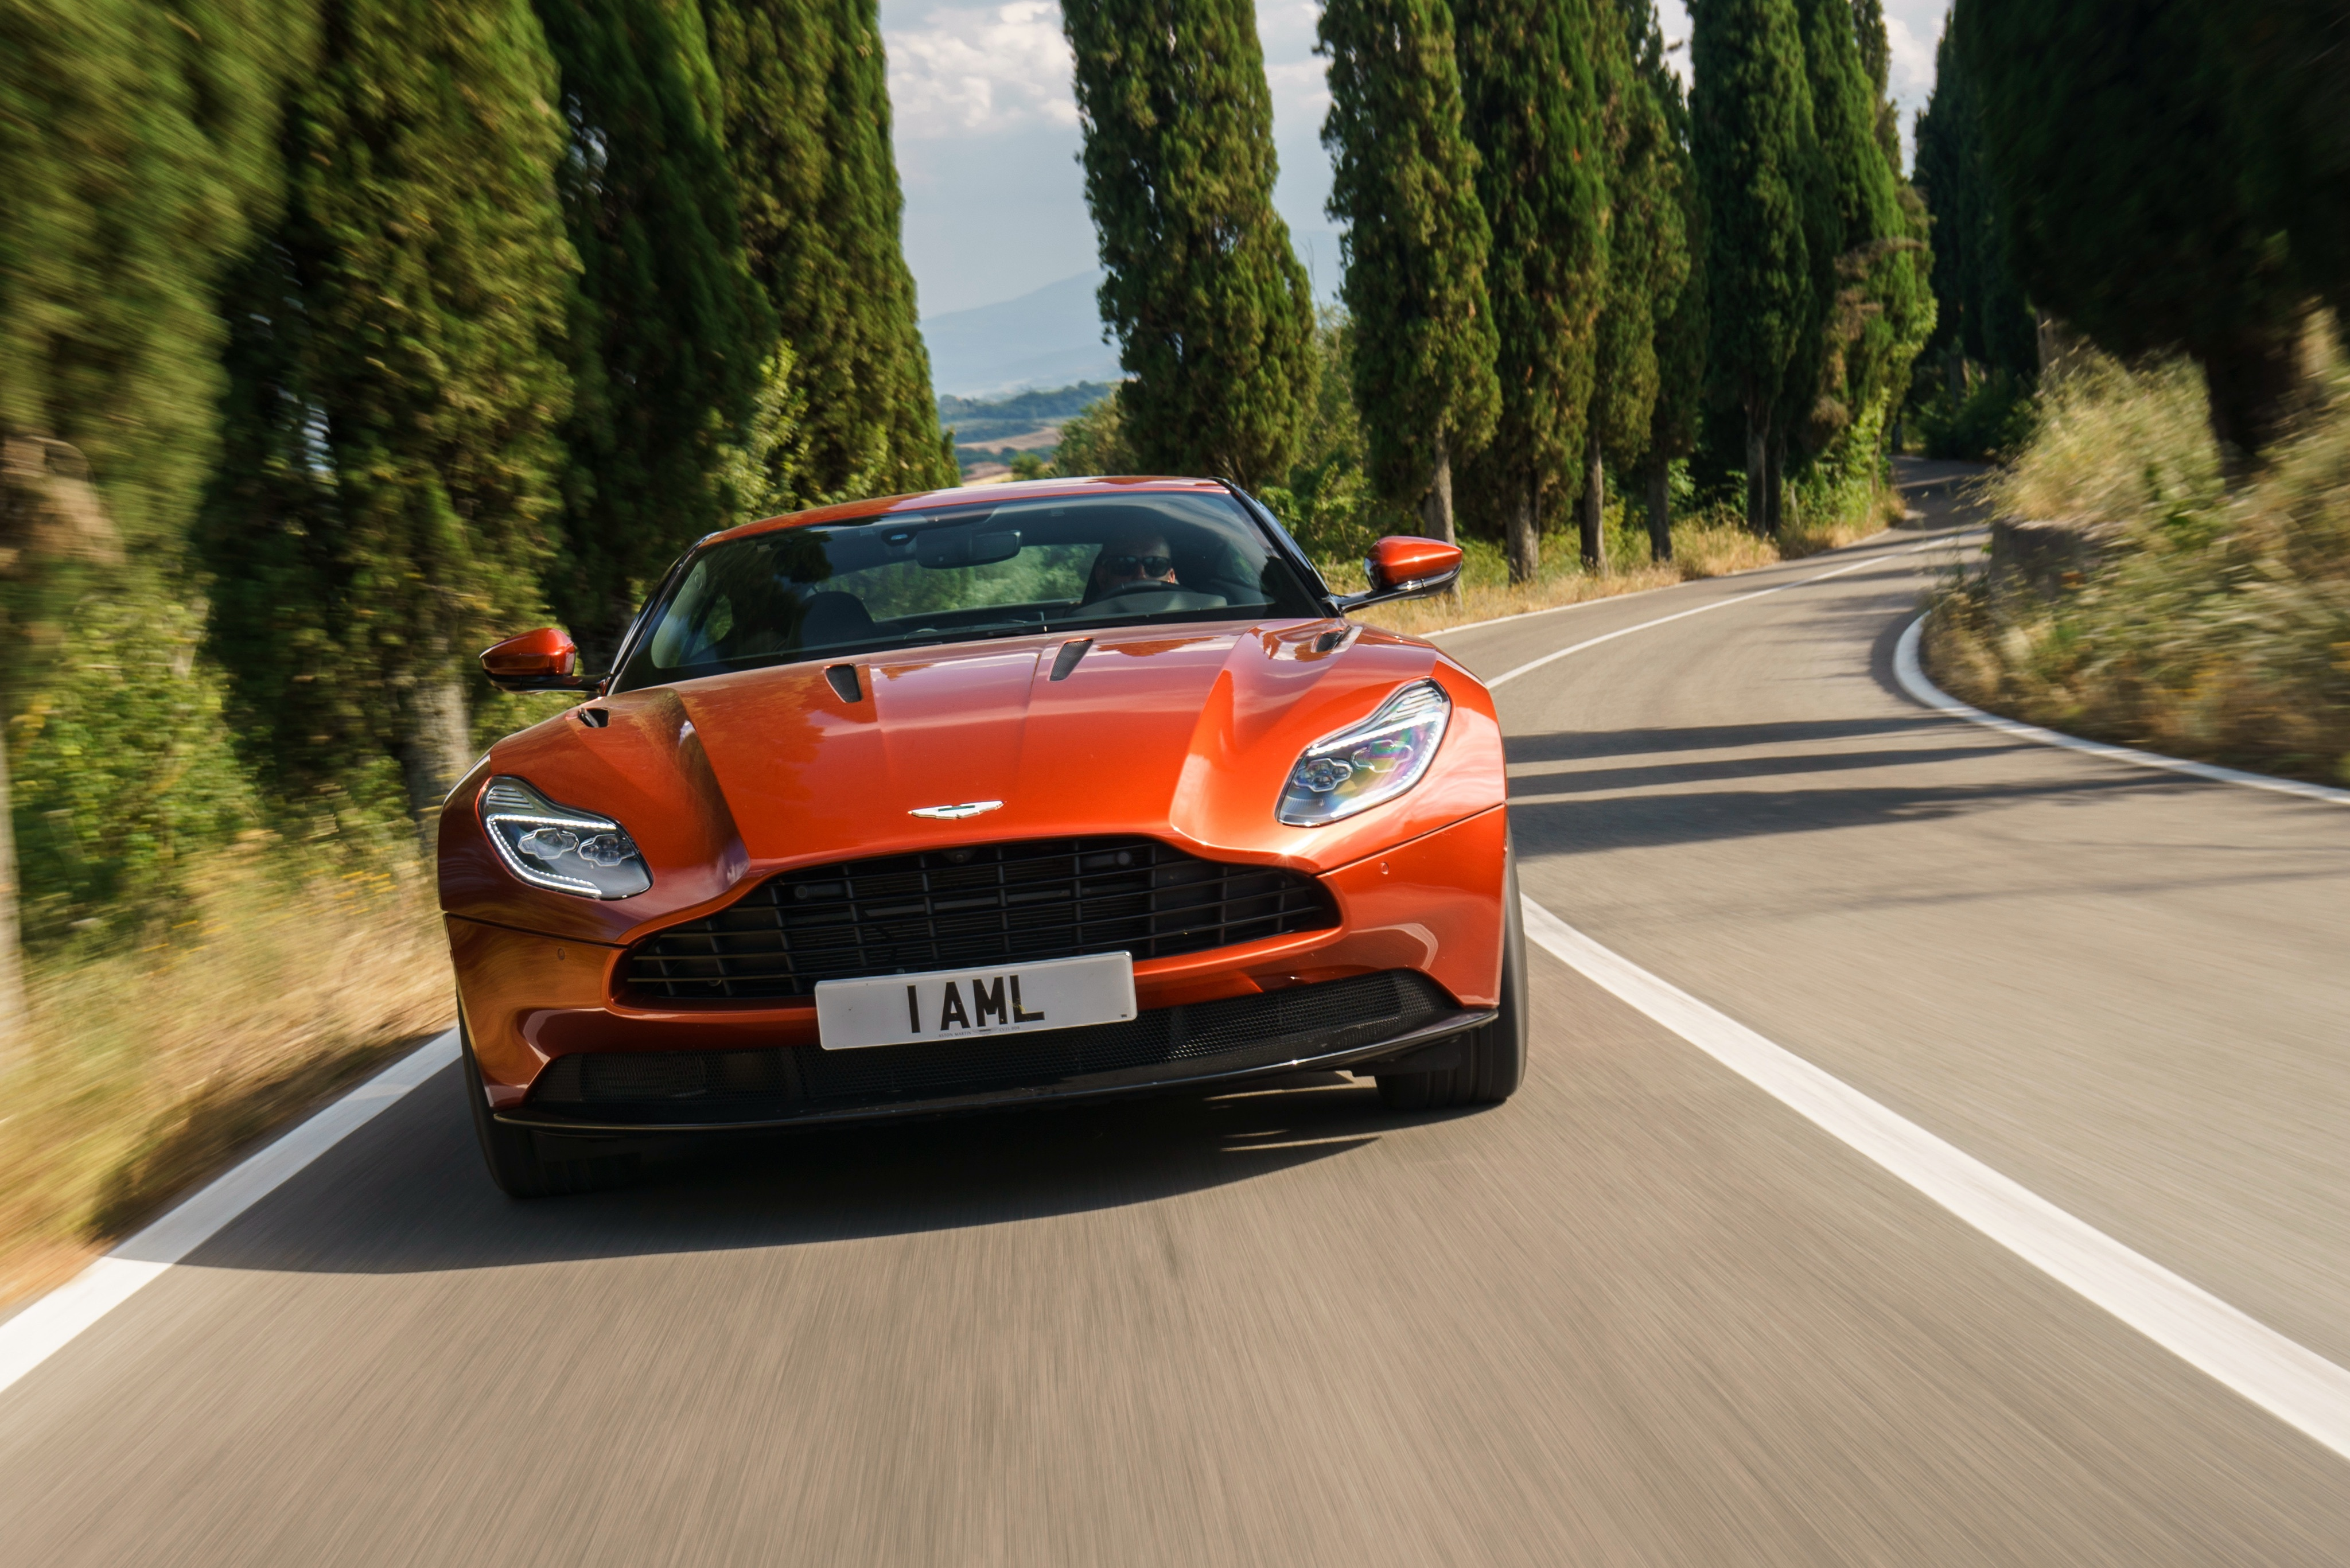 127742 Заставки и Обои Астон Мартин (Aston Martin) на телефон. Скачать Астон Мартин (Aston Martin), Тачки (Cars), Красный, Вид Спереди, Db11 картинки бесплатно